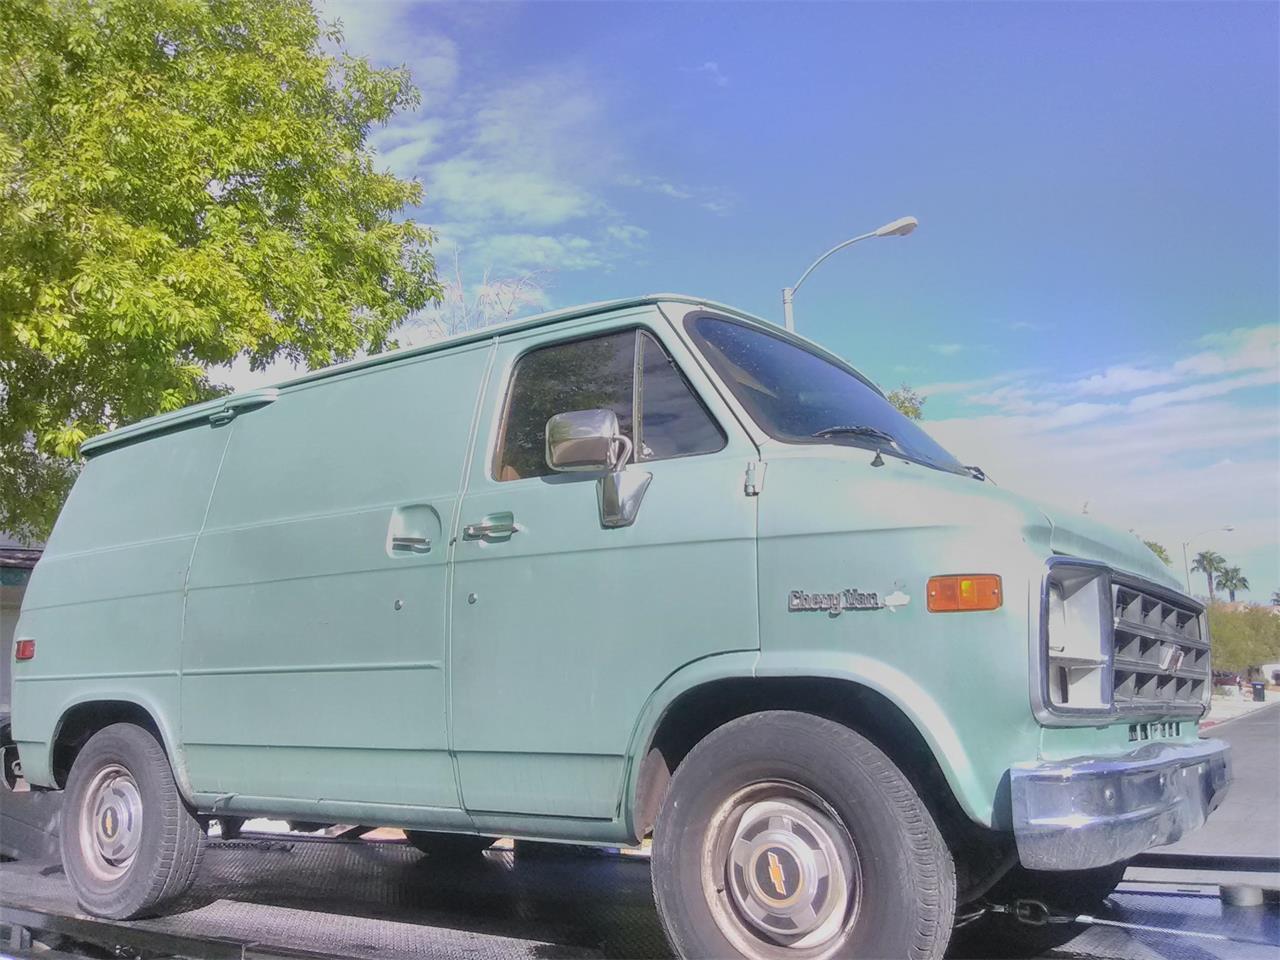 1979 Chevrolet Van For Sale Classiccars Com Cc 1190098